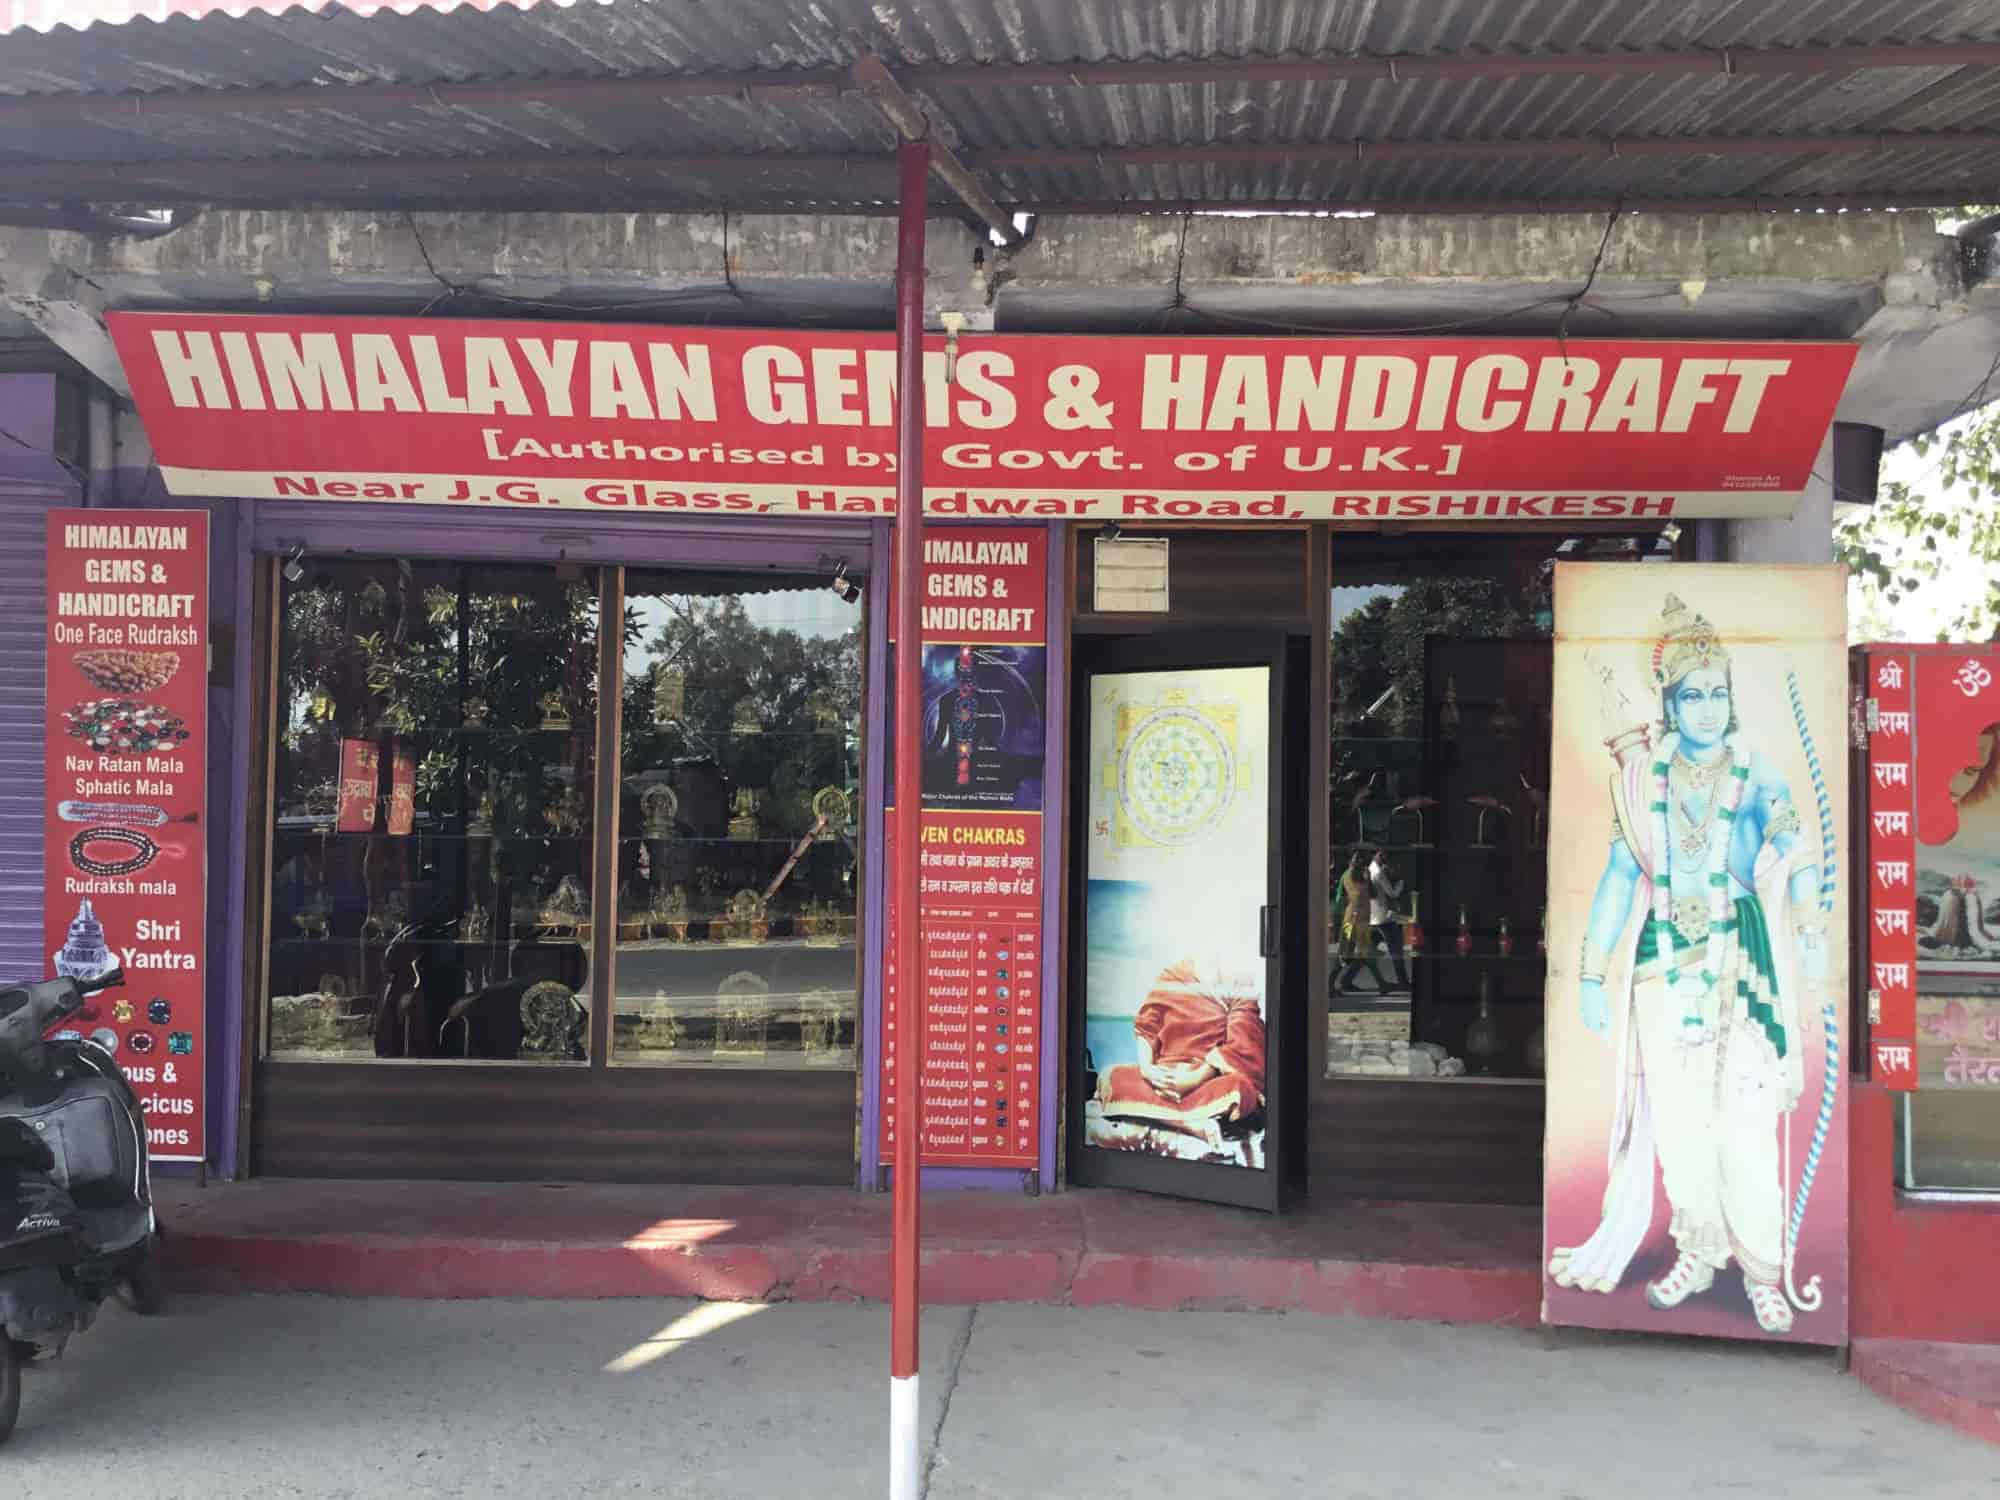 Uttaranchal Himalayan Gems Handicraft Uttaranchal Himalyan Gems